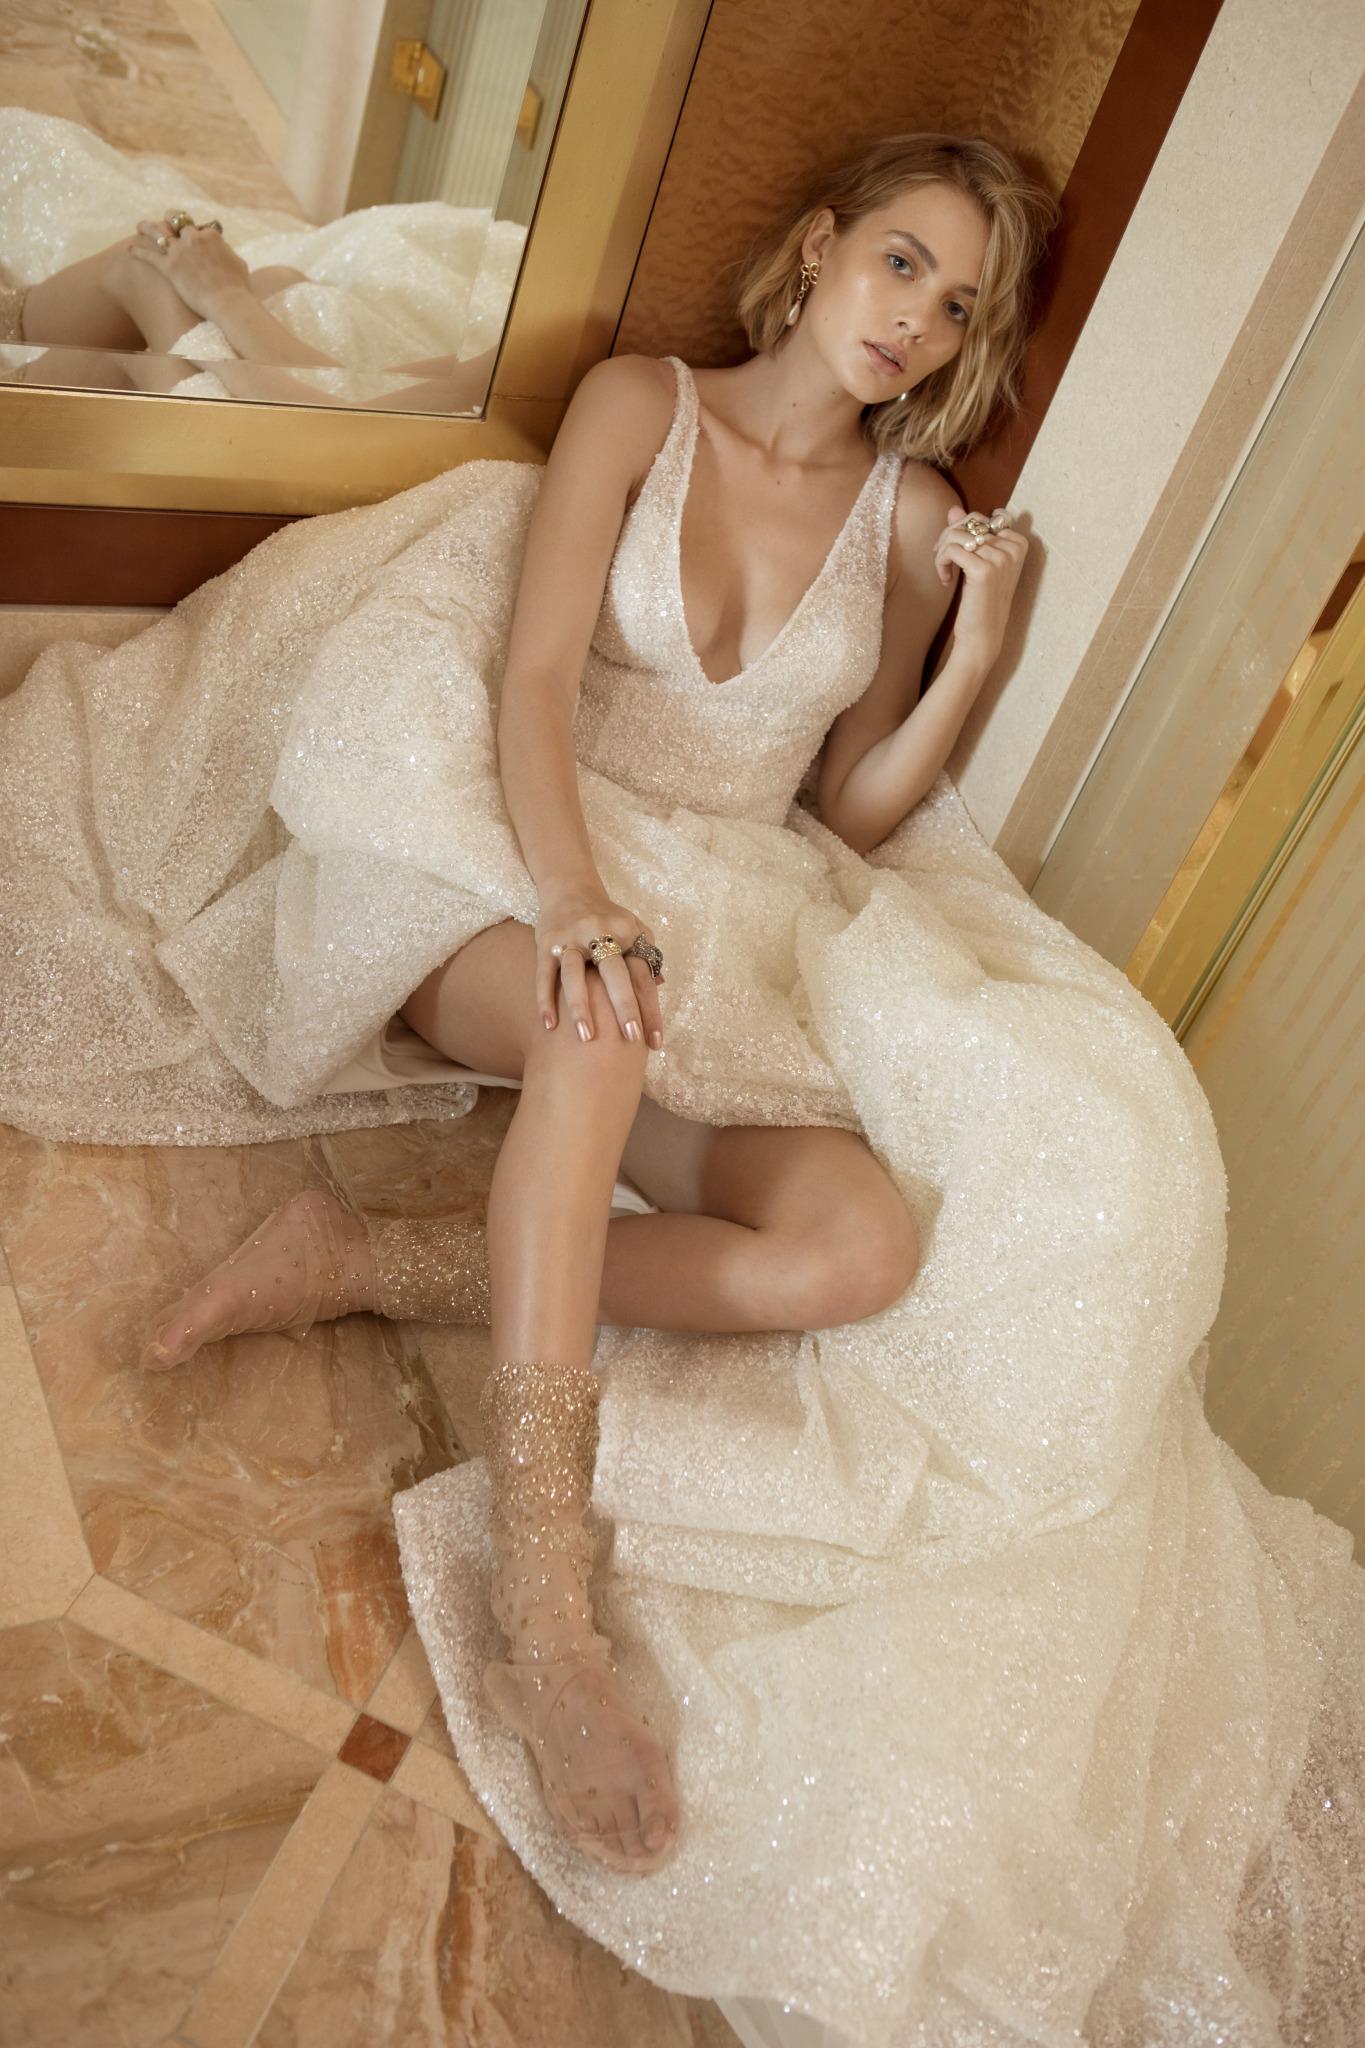 onedaybridal-1985-wedding-dress-collection-pfeiffer_preview.jpeg